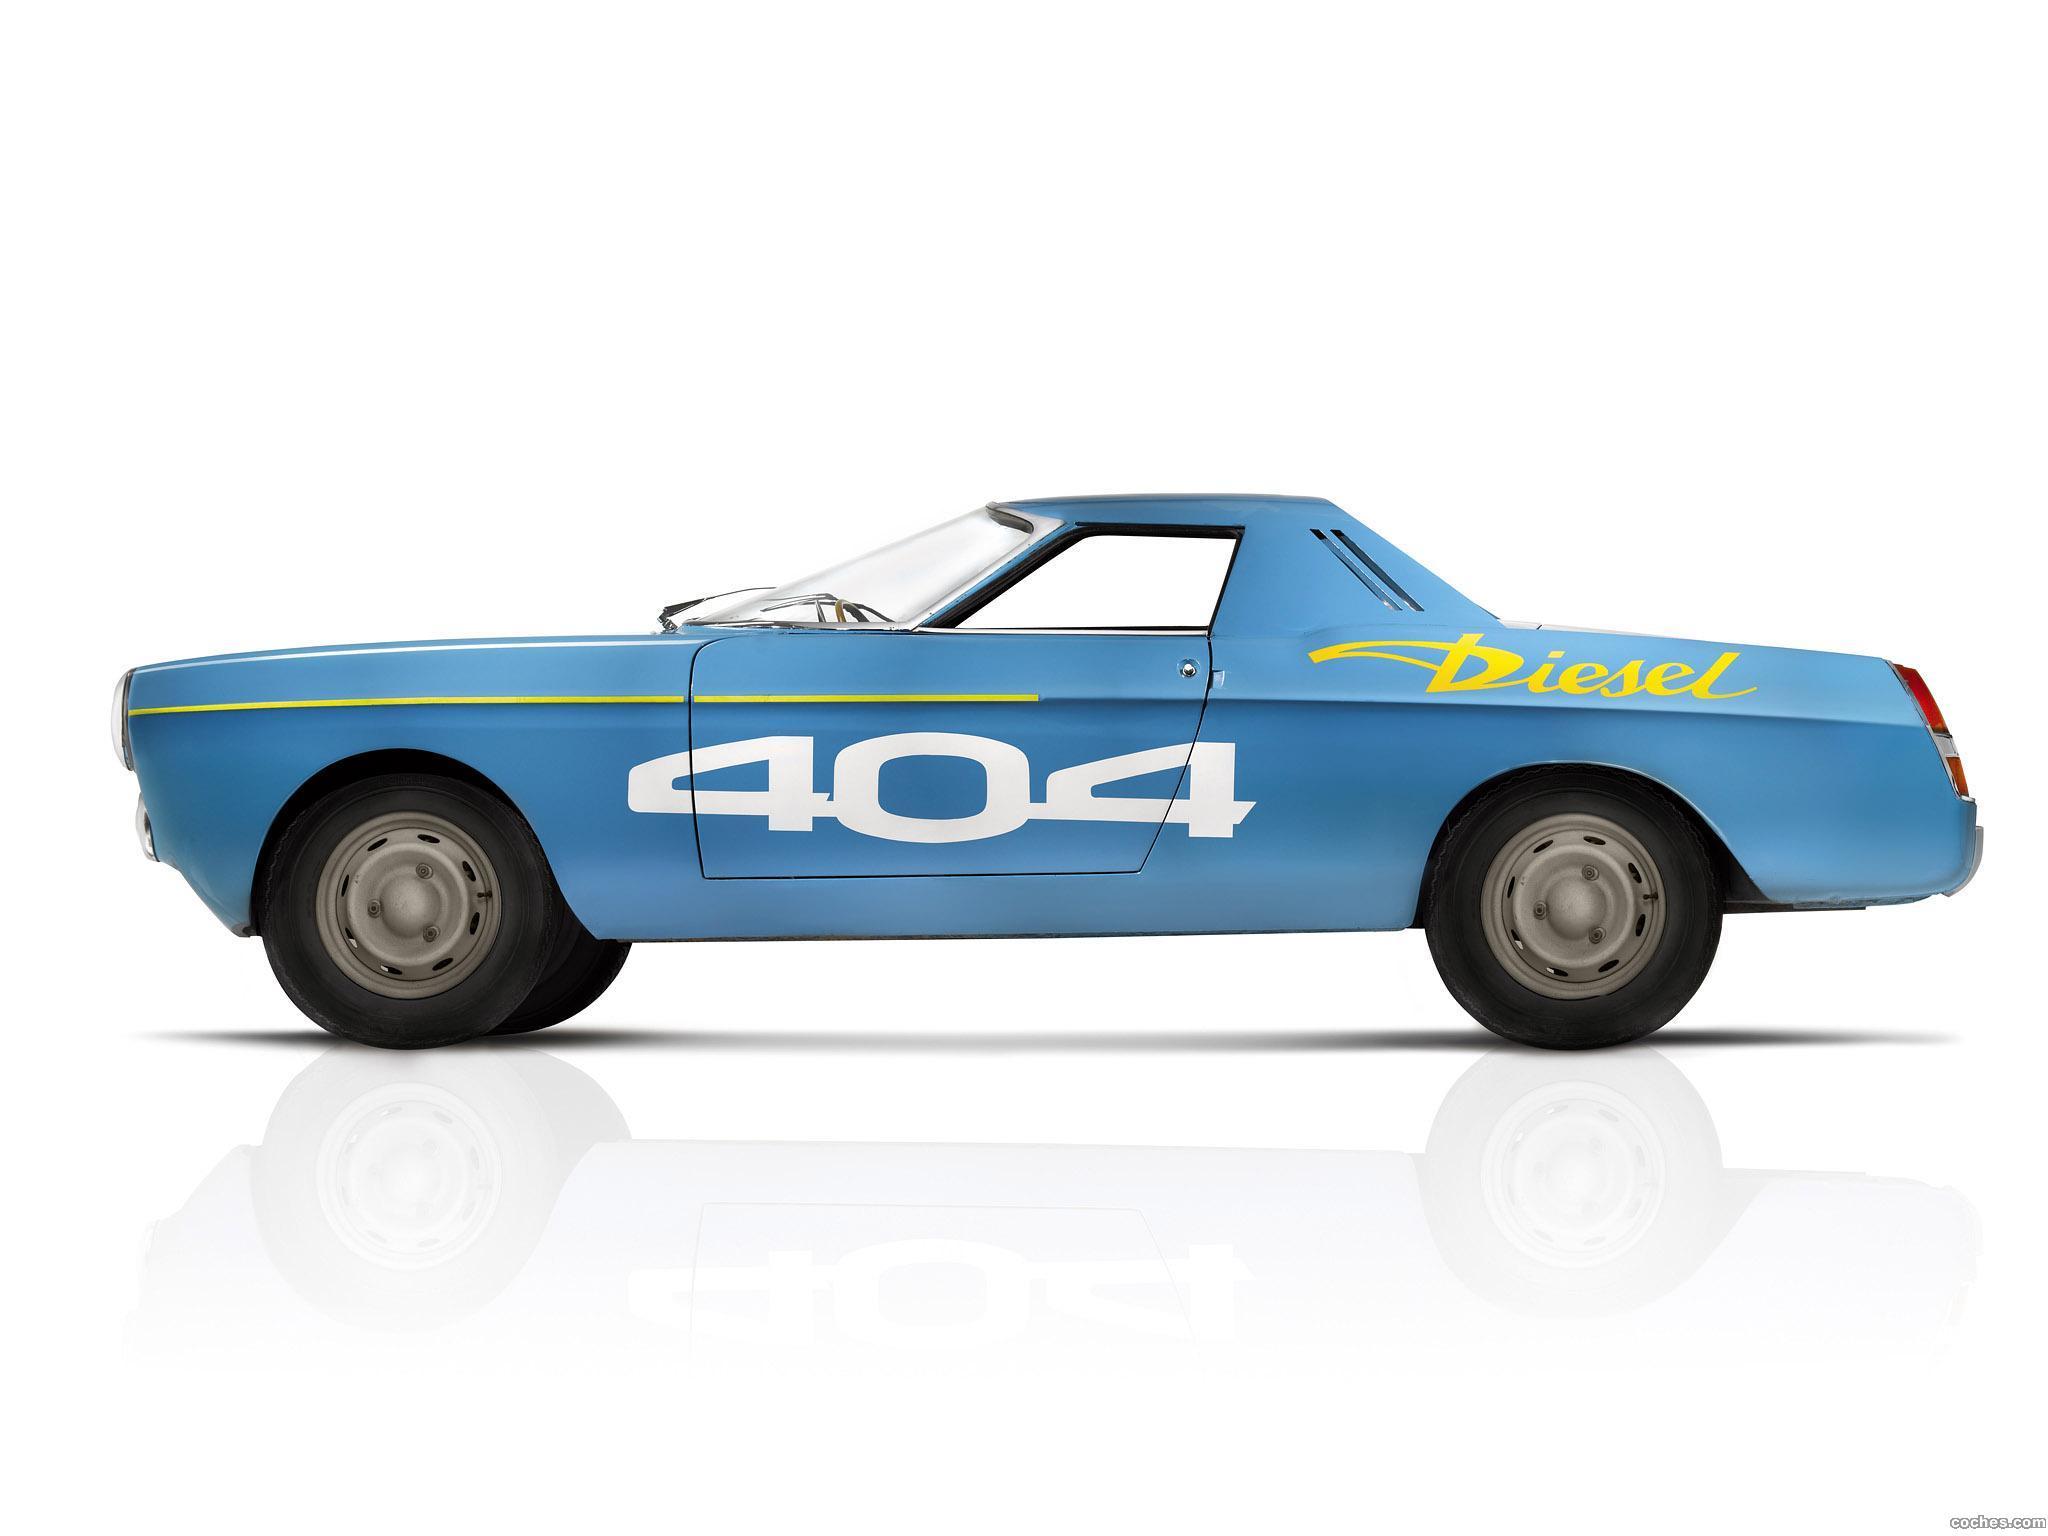 Foto 1 de Peugeot Diesel Record Car 1965